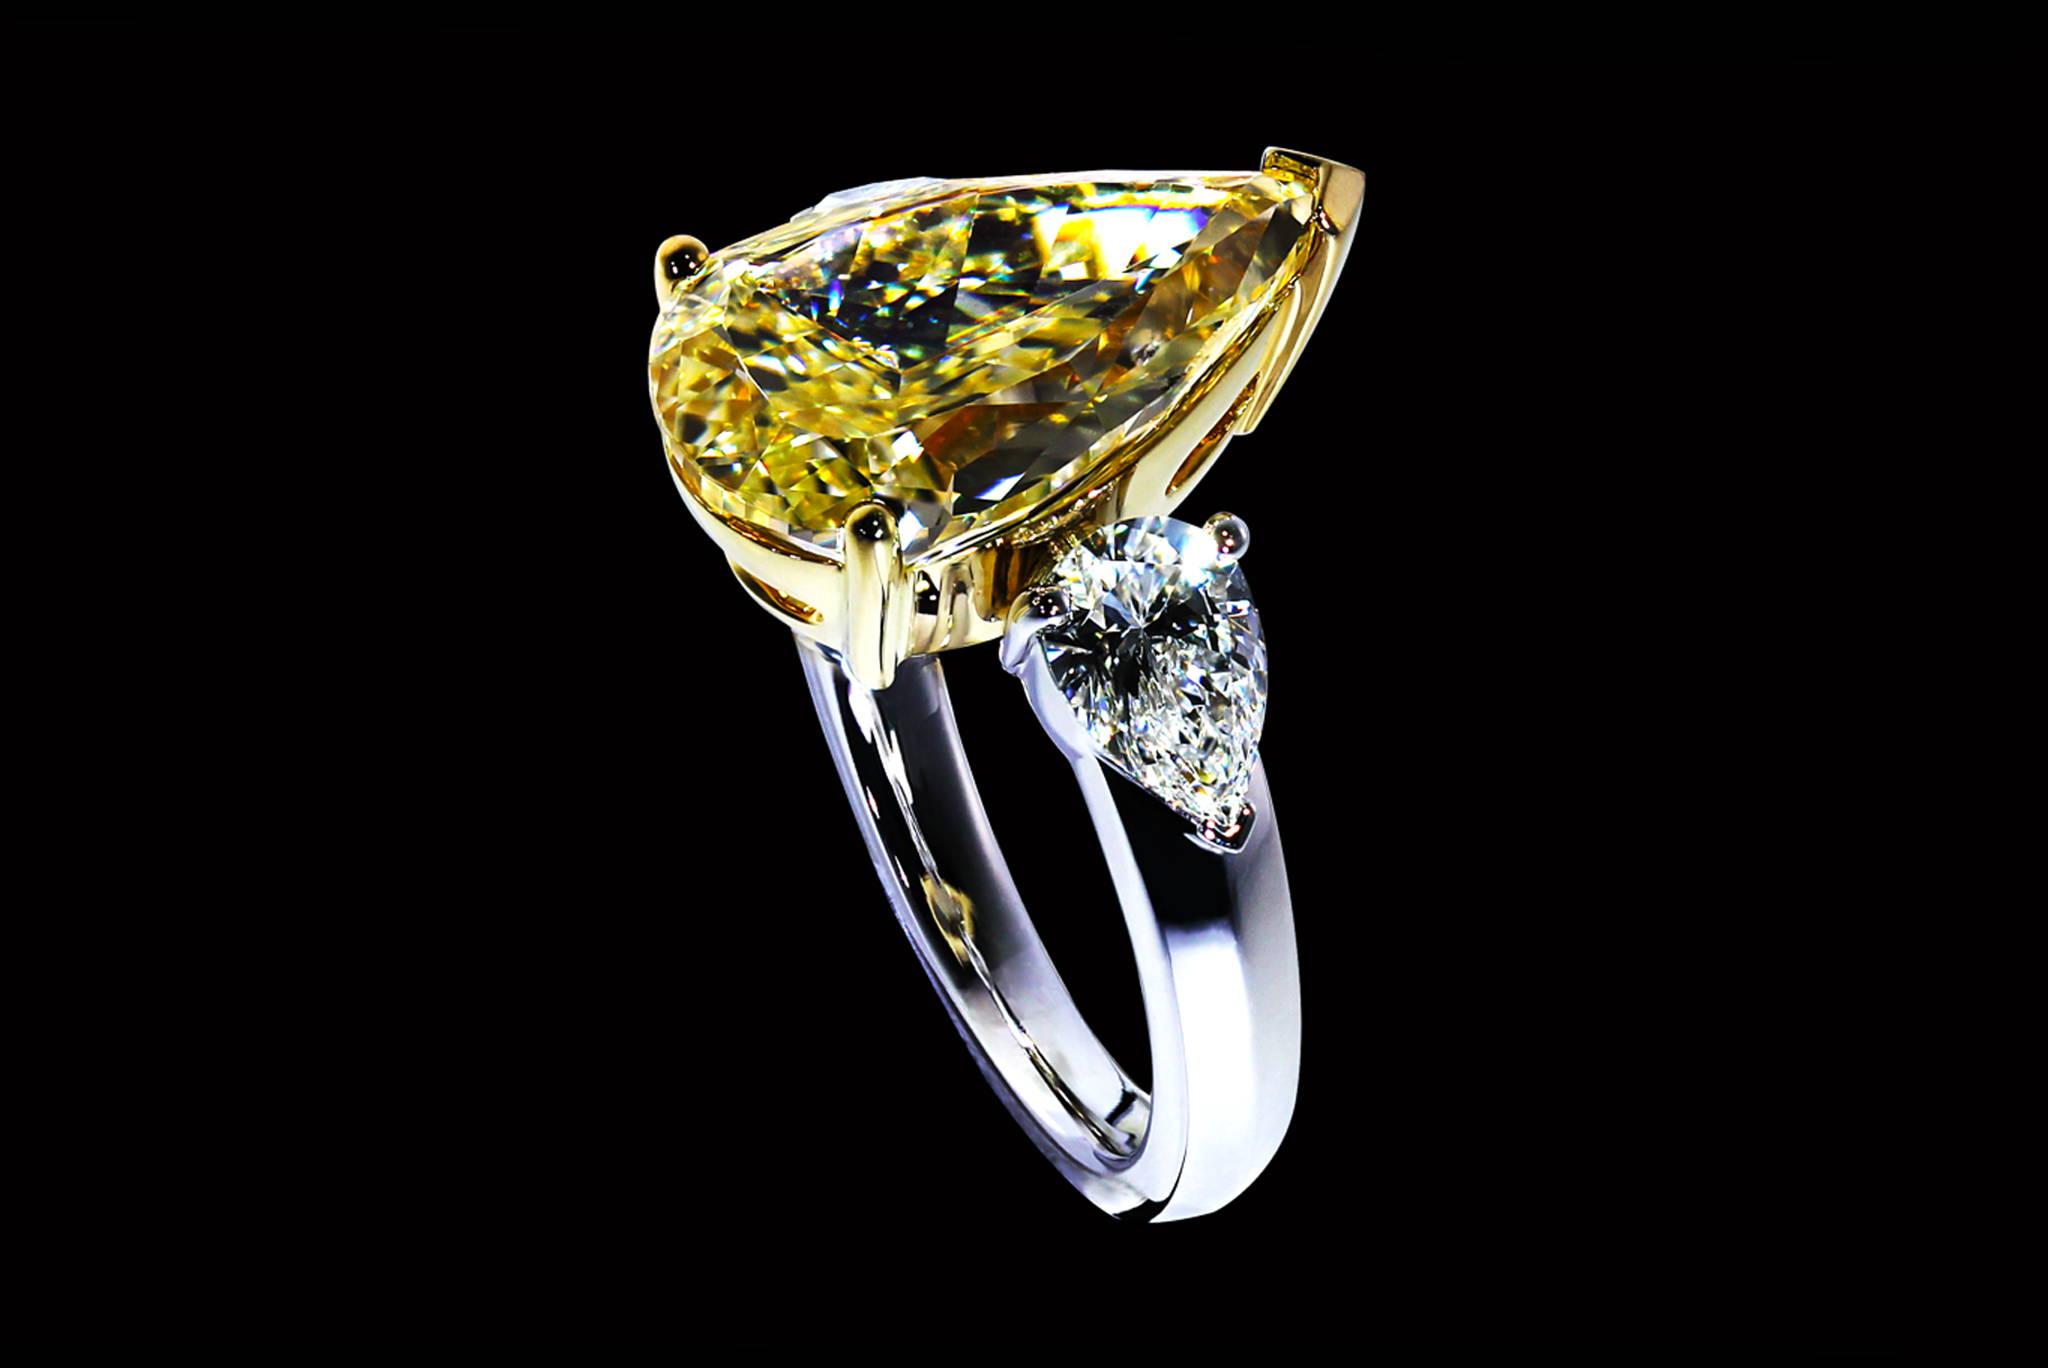 Fancy Intense Yellow Pear Shape Diamond Ring degrees view